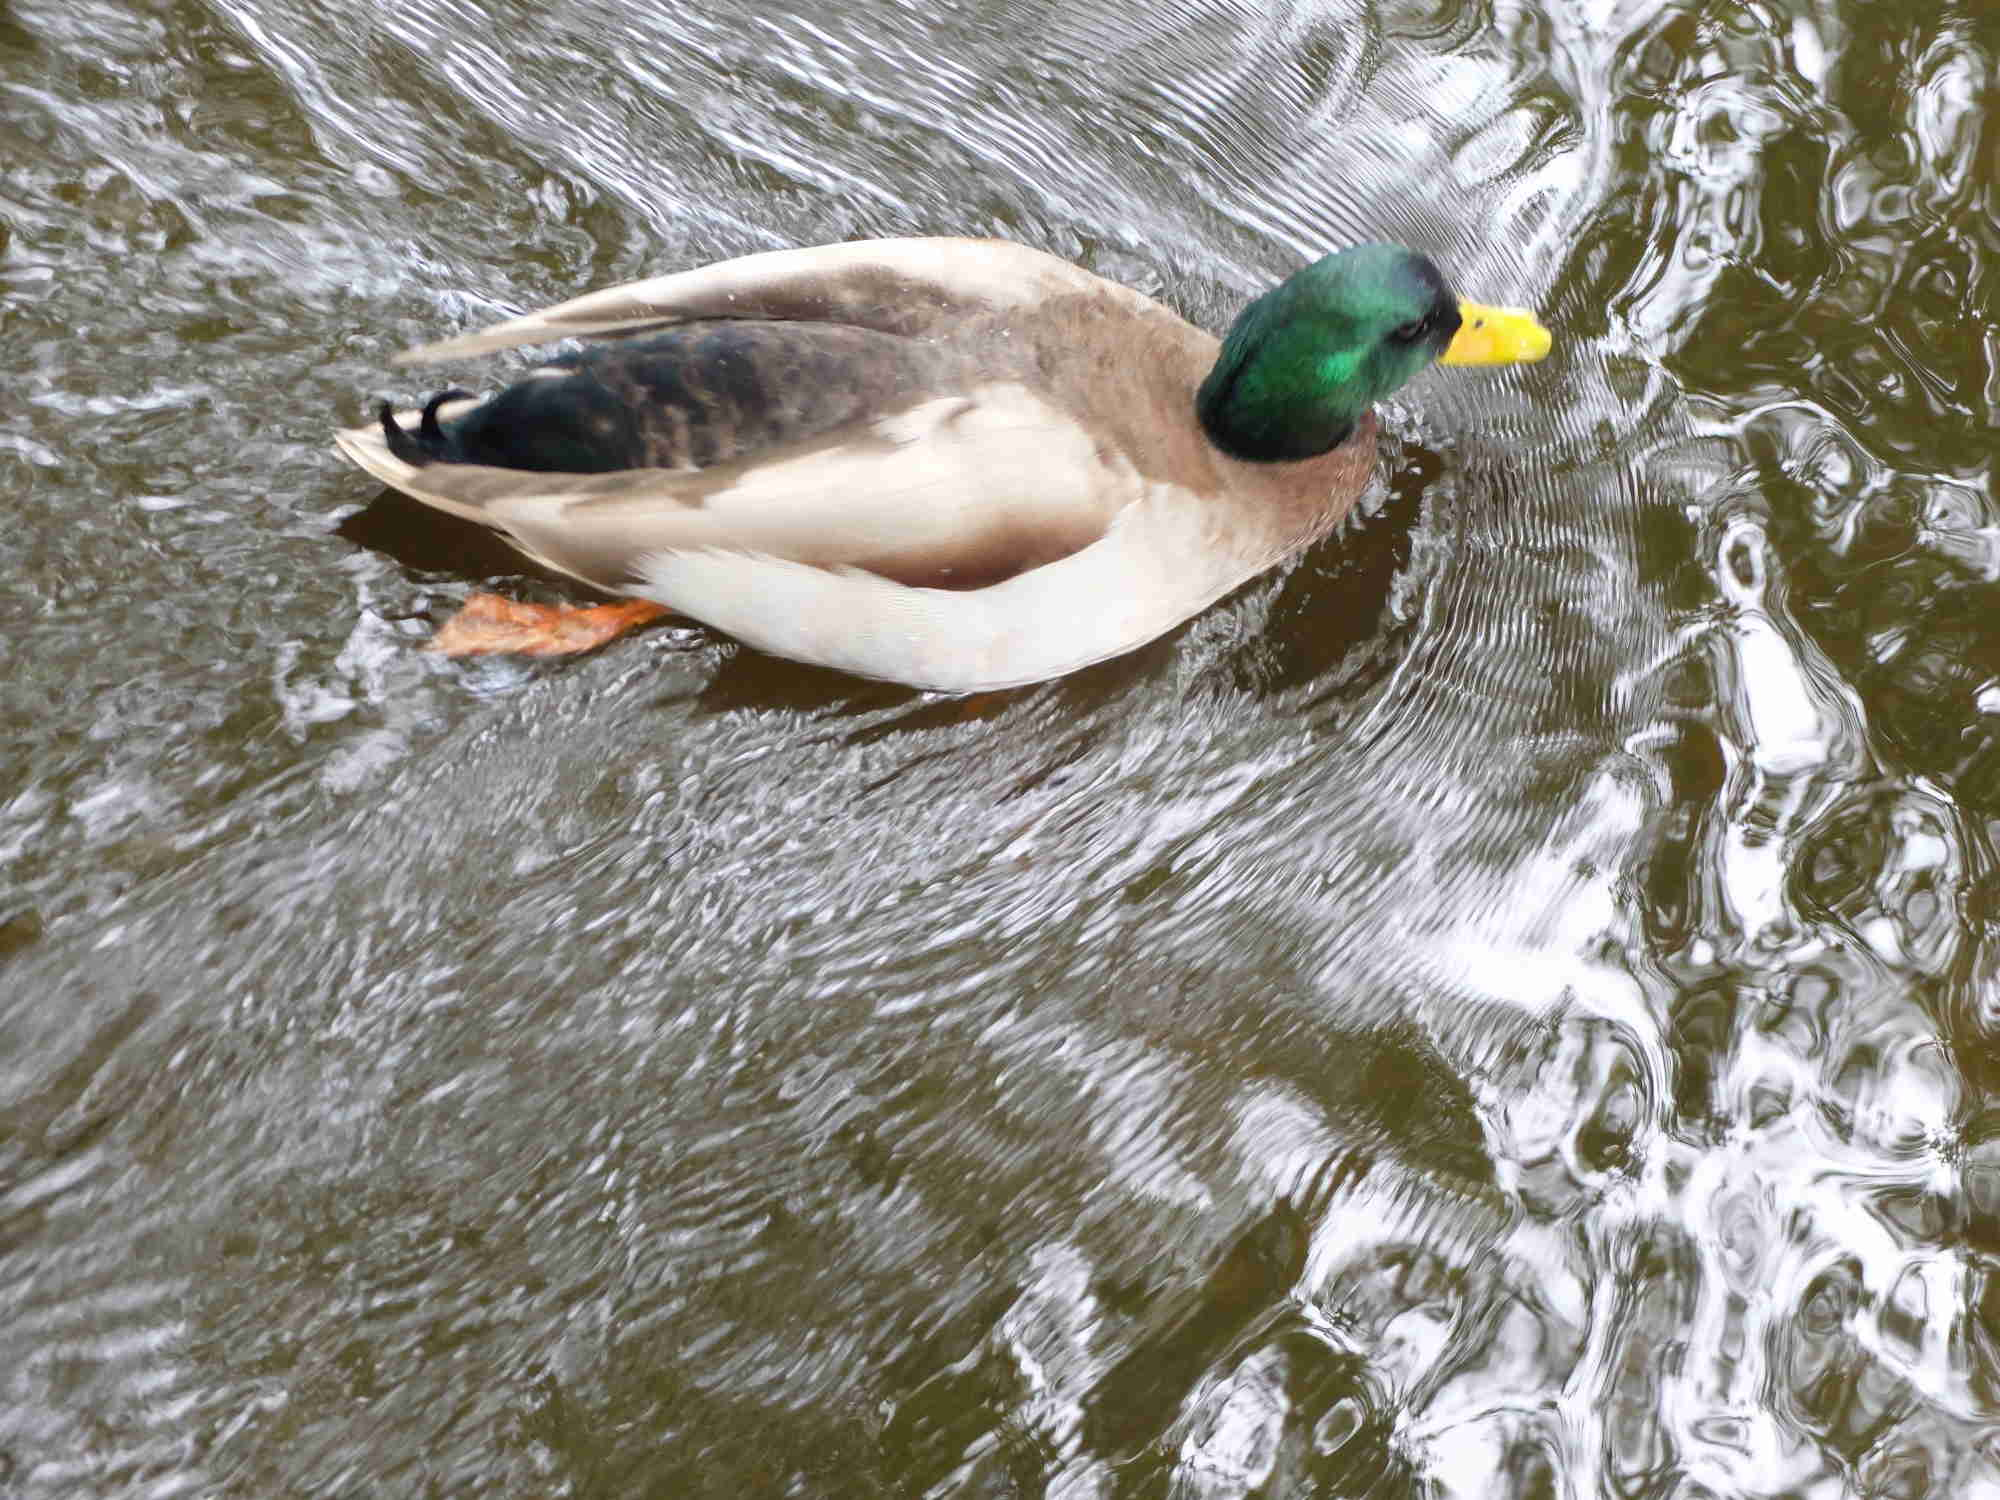 Canard qui fend l'eau